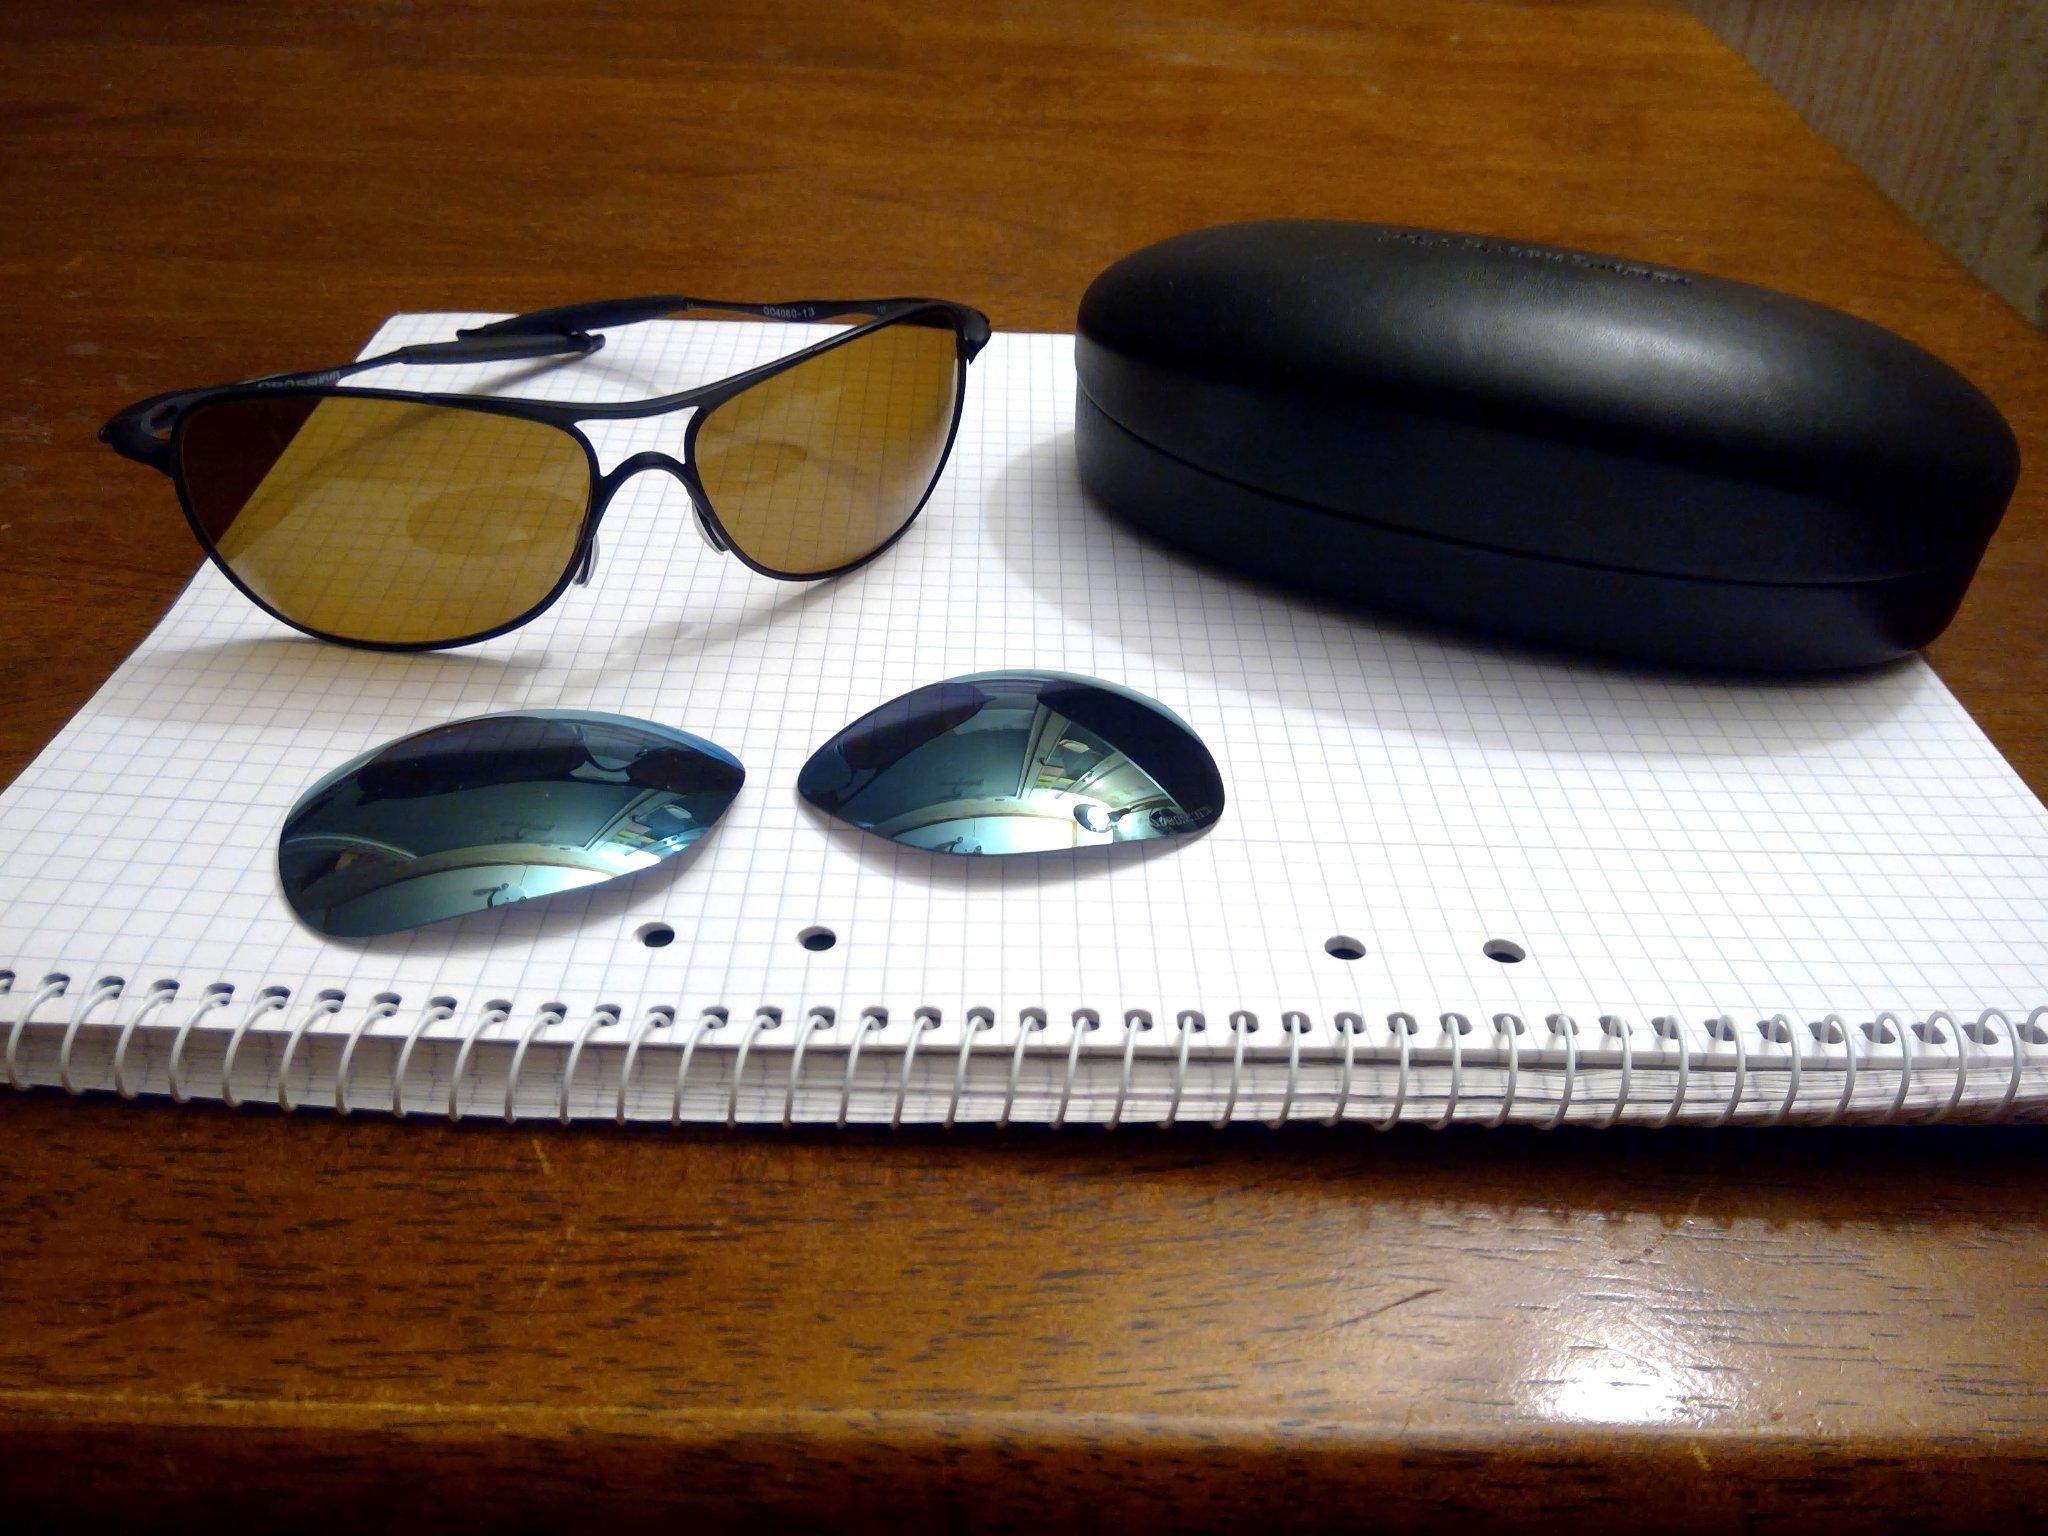 Oakley Crosshair Hög Kvalitets Solglasögon me.. (355807159